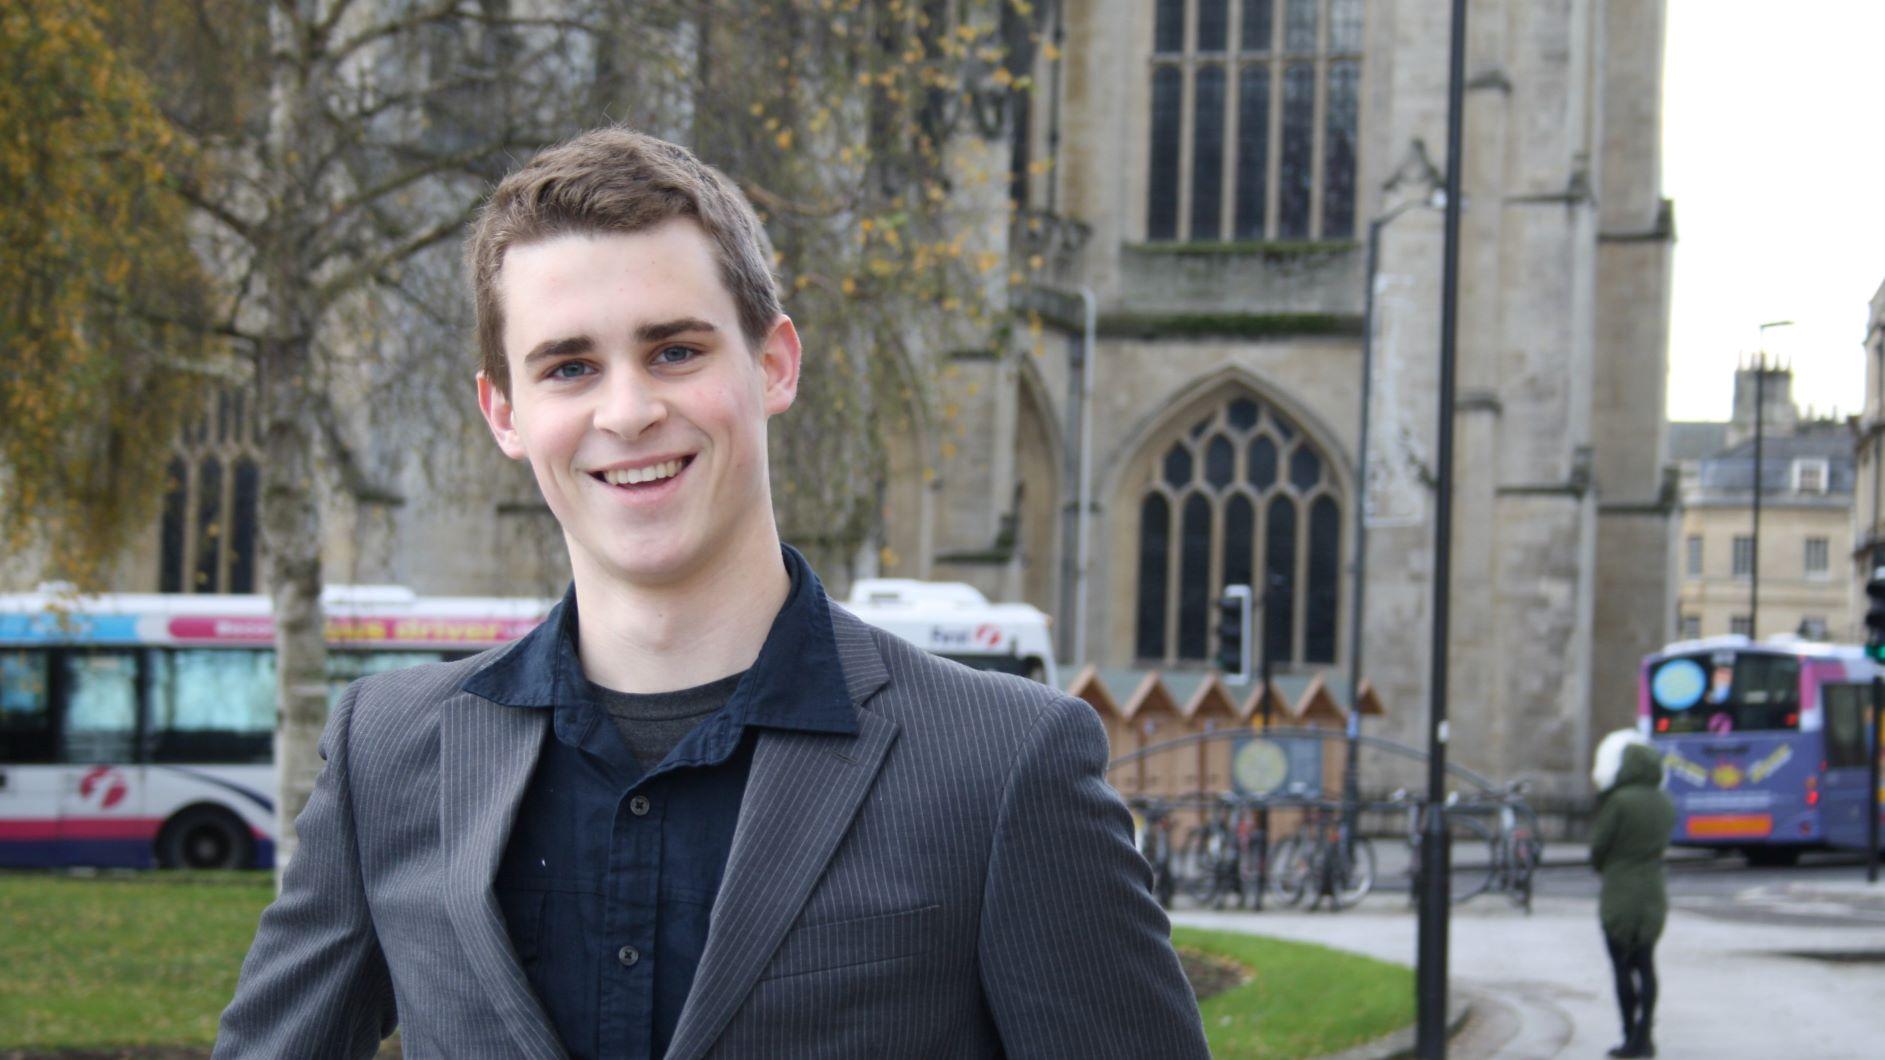 Computer Science graduate and Bath entrepreneur Ashton Clapp